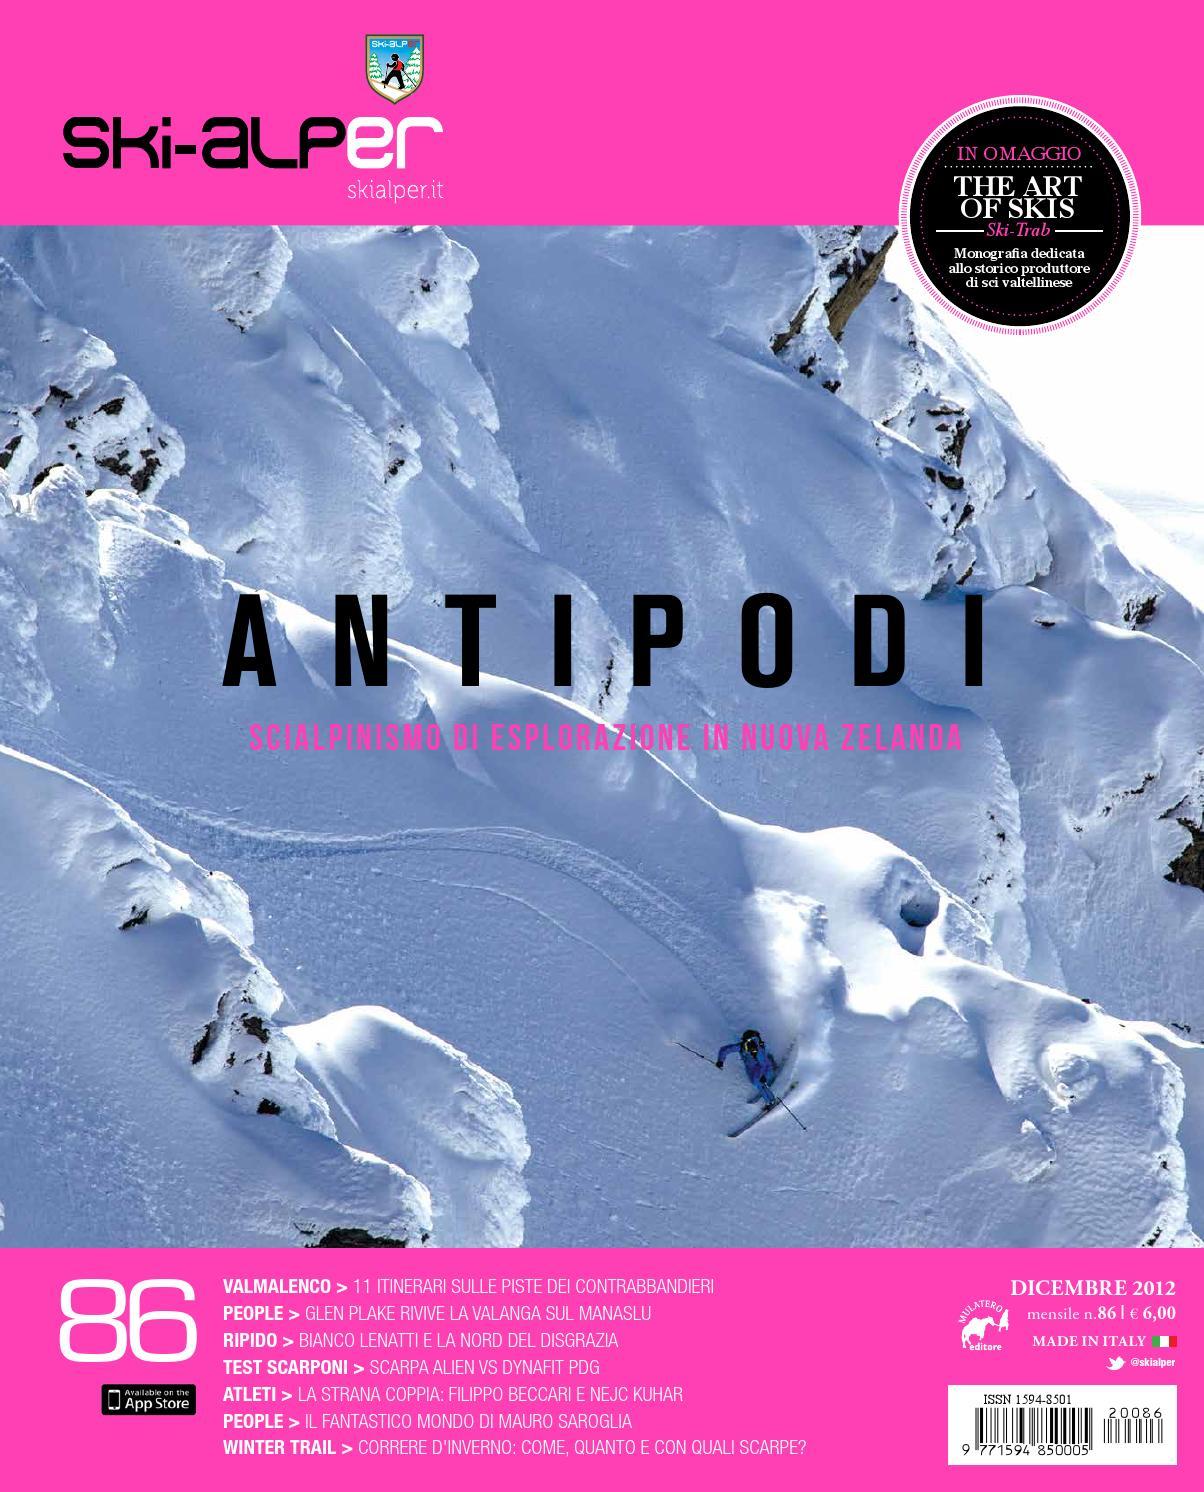 Ski-alper 86 by Mulatero Editore - issuu 368271f9bdf